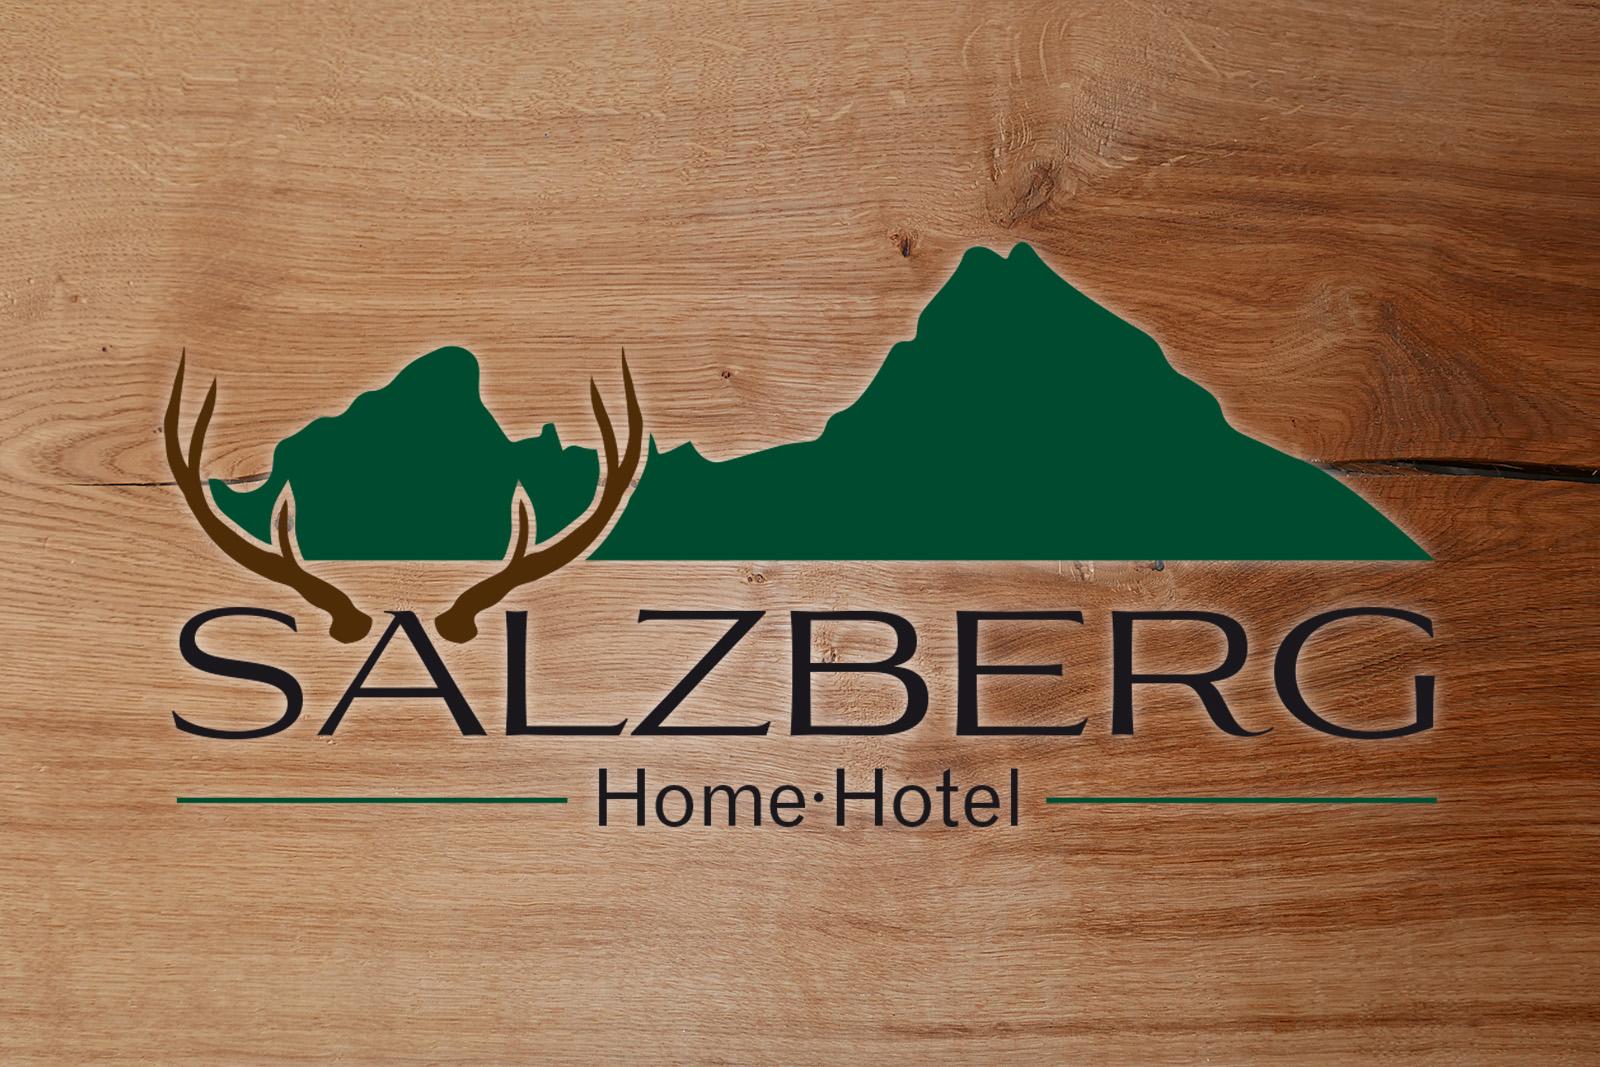 Home-Hotel Salzberg